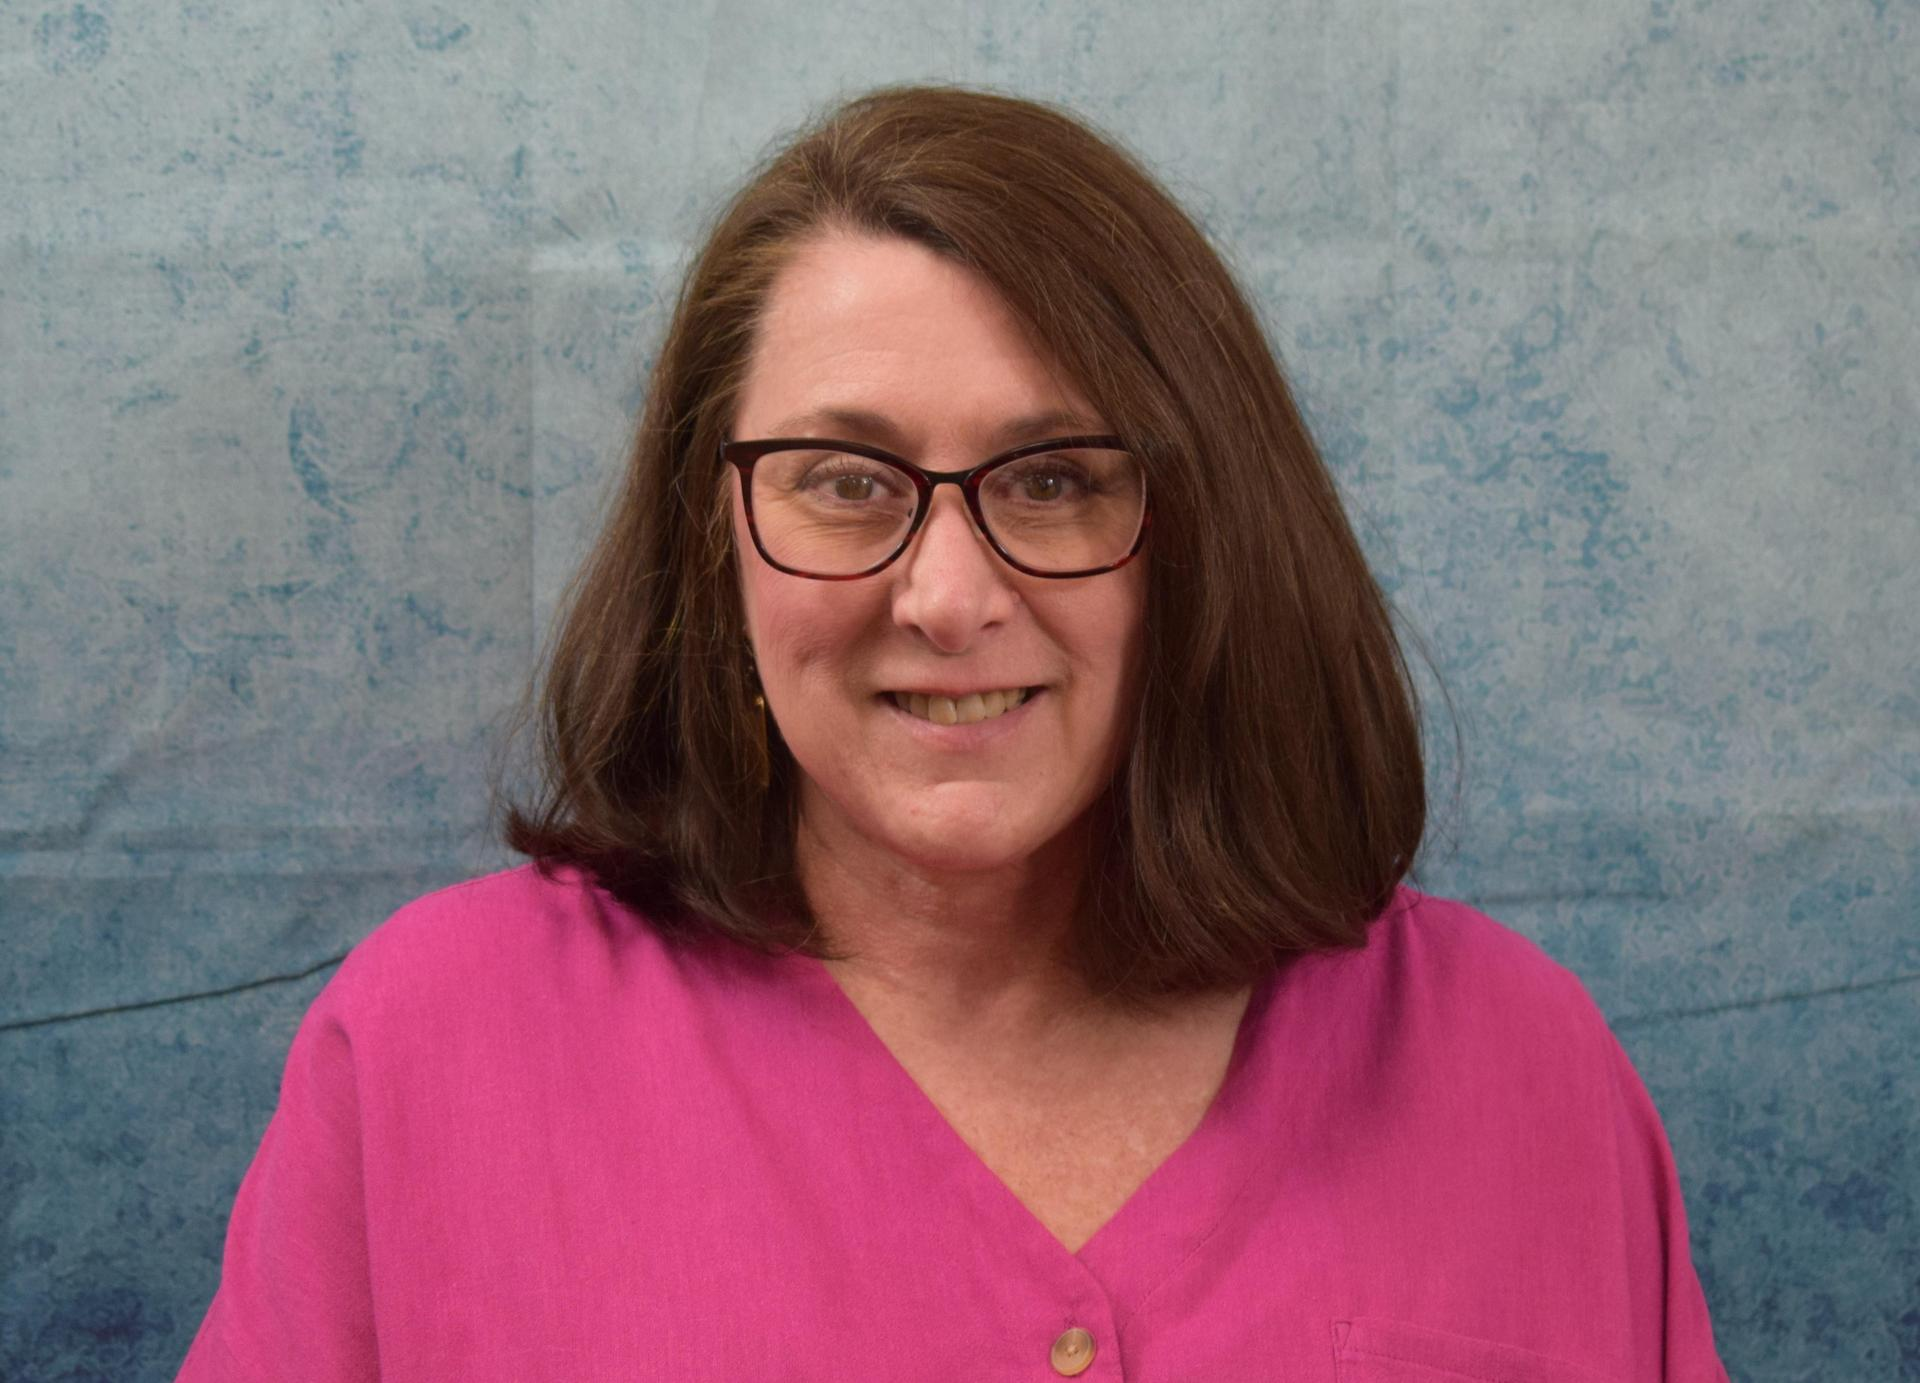 Beth Herrin, Case Manager